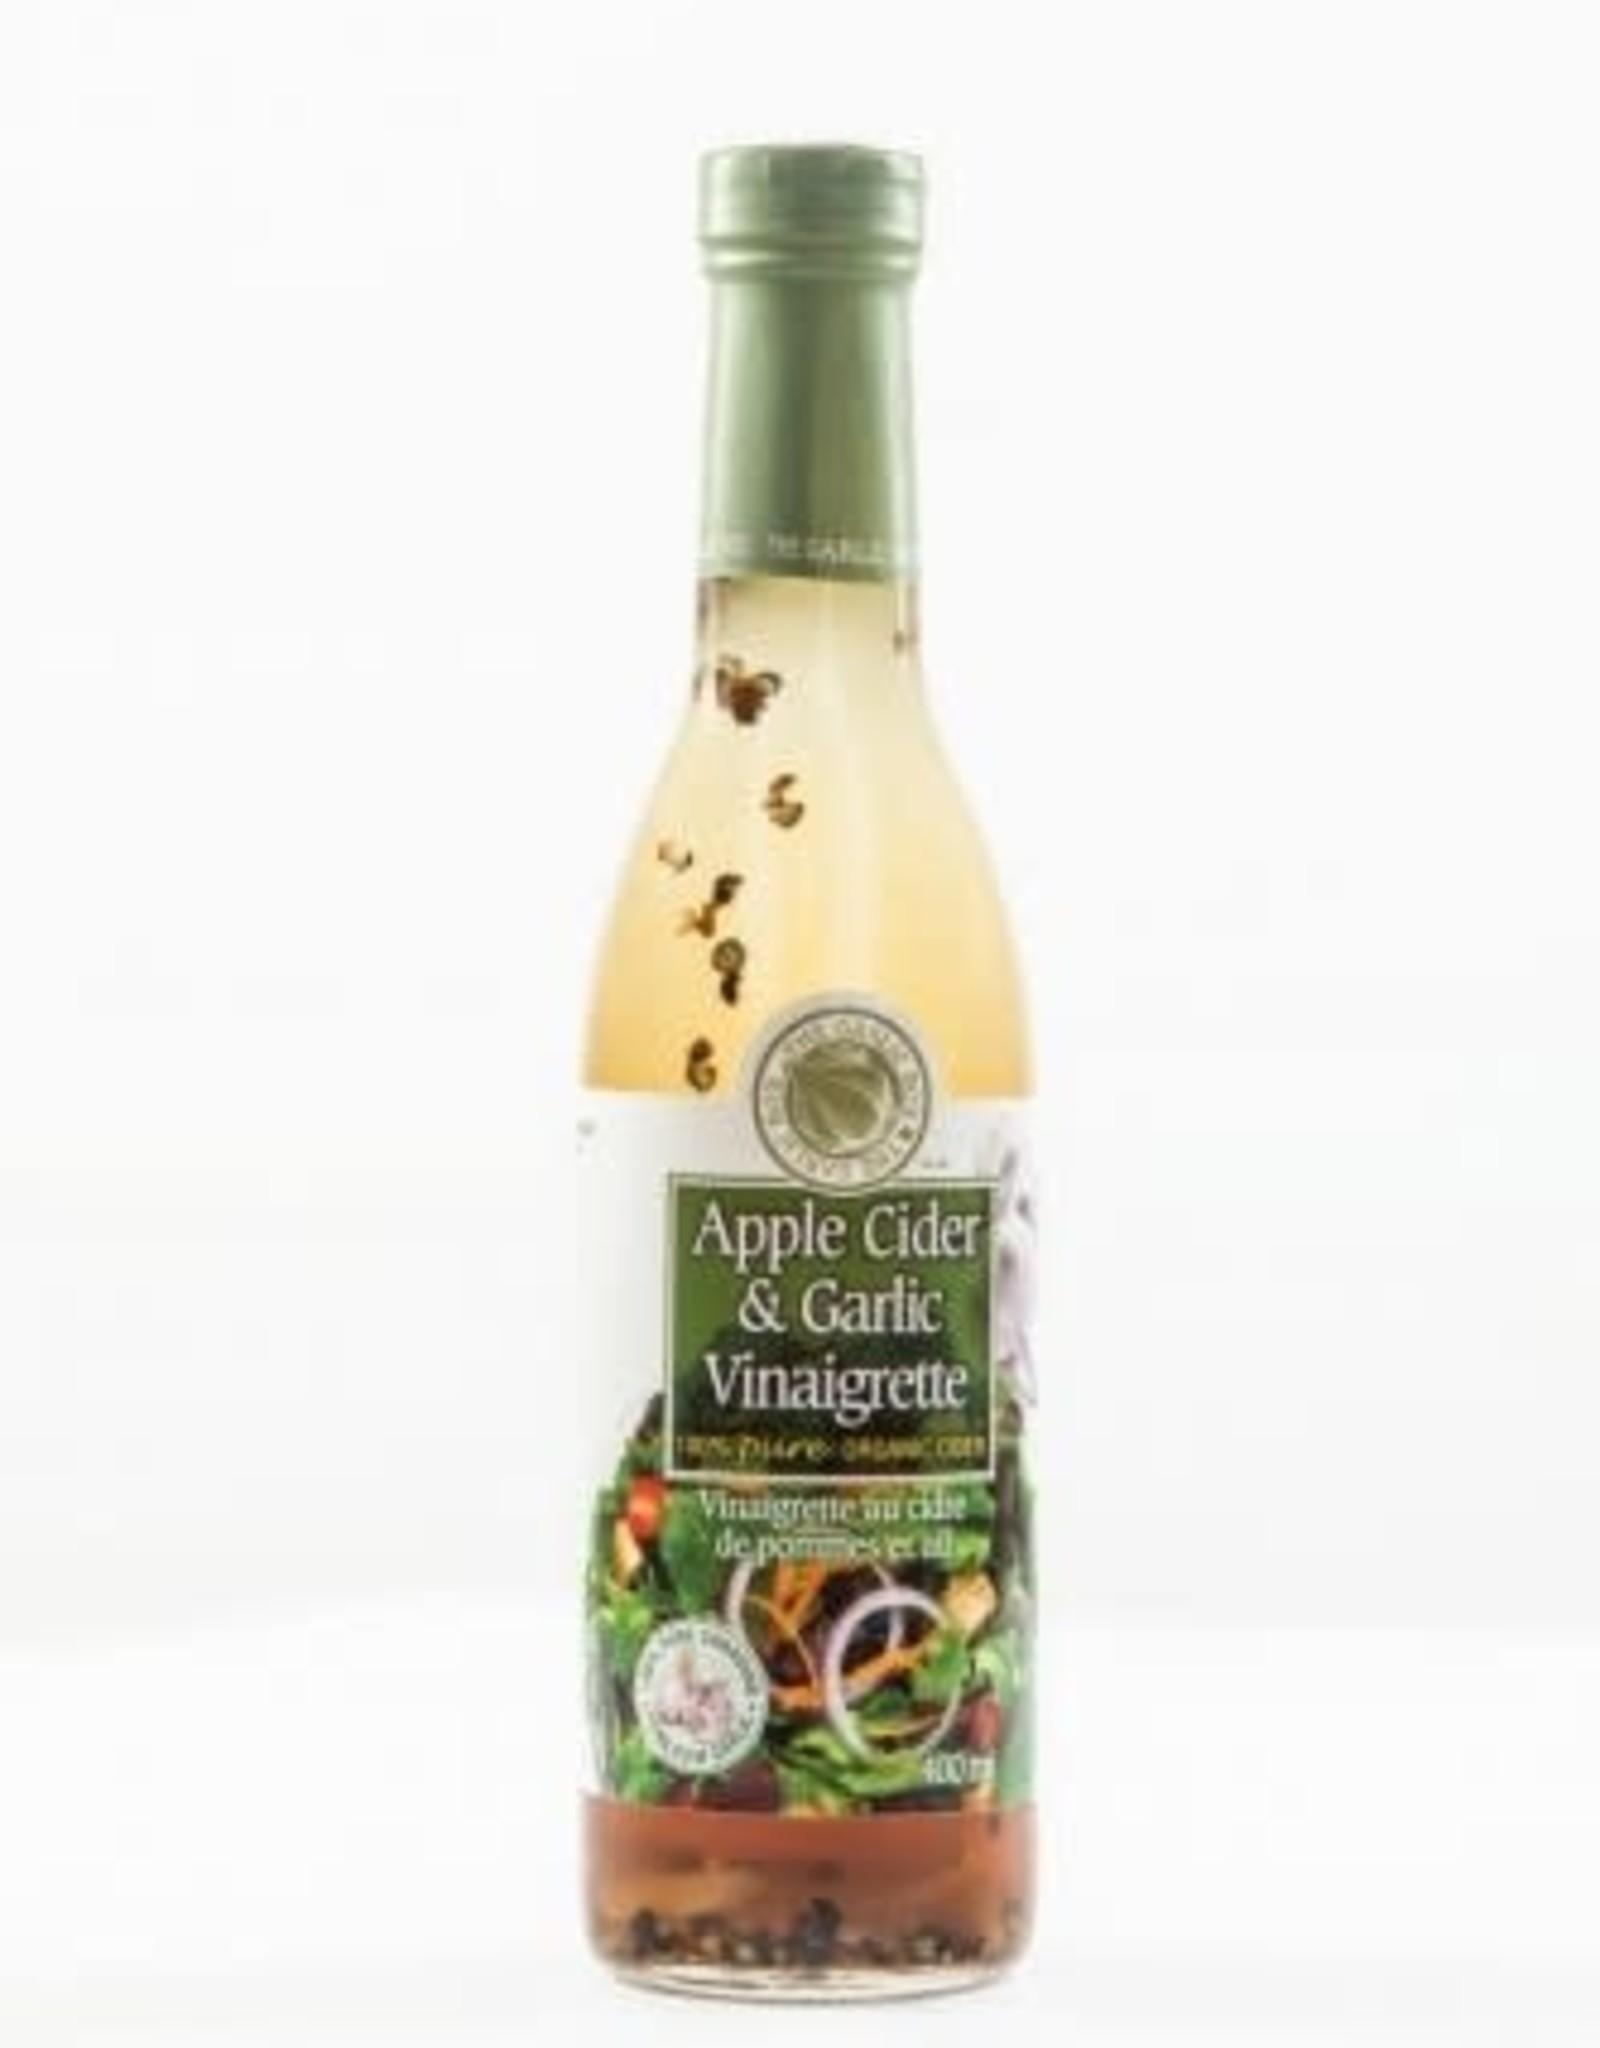 The Garlic Box Apple Cider & Garlic Vinaigrette